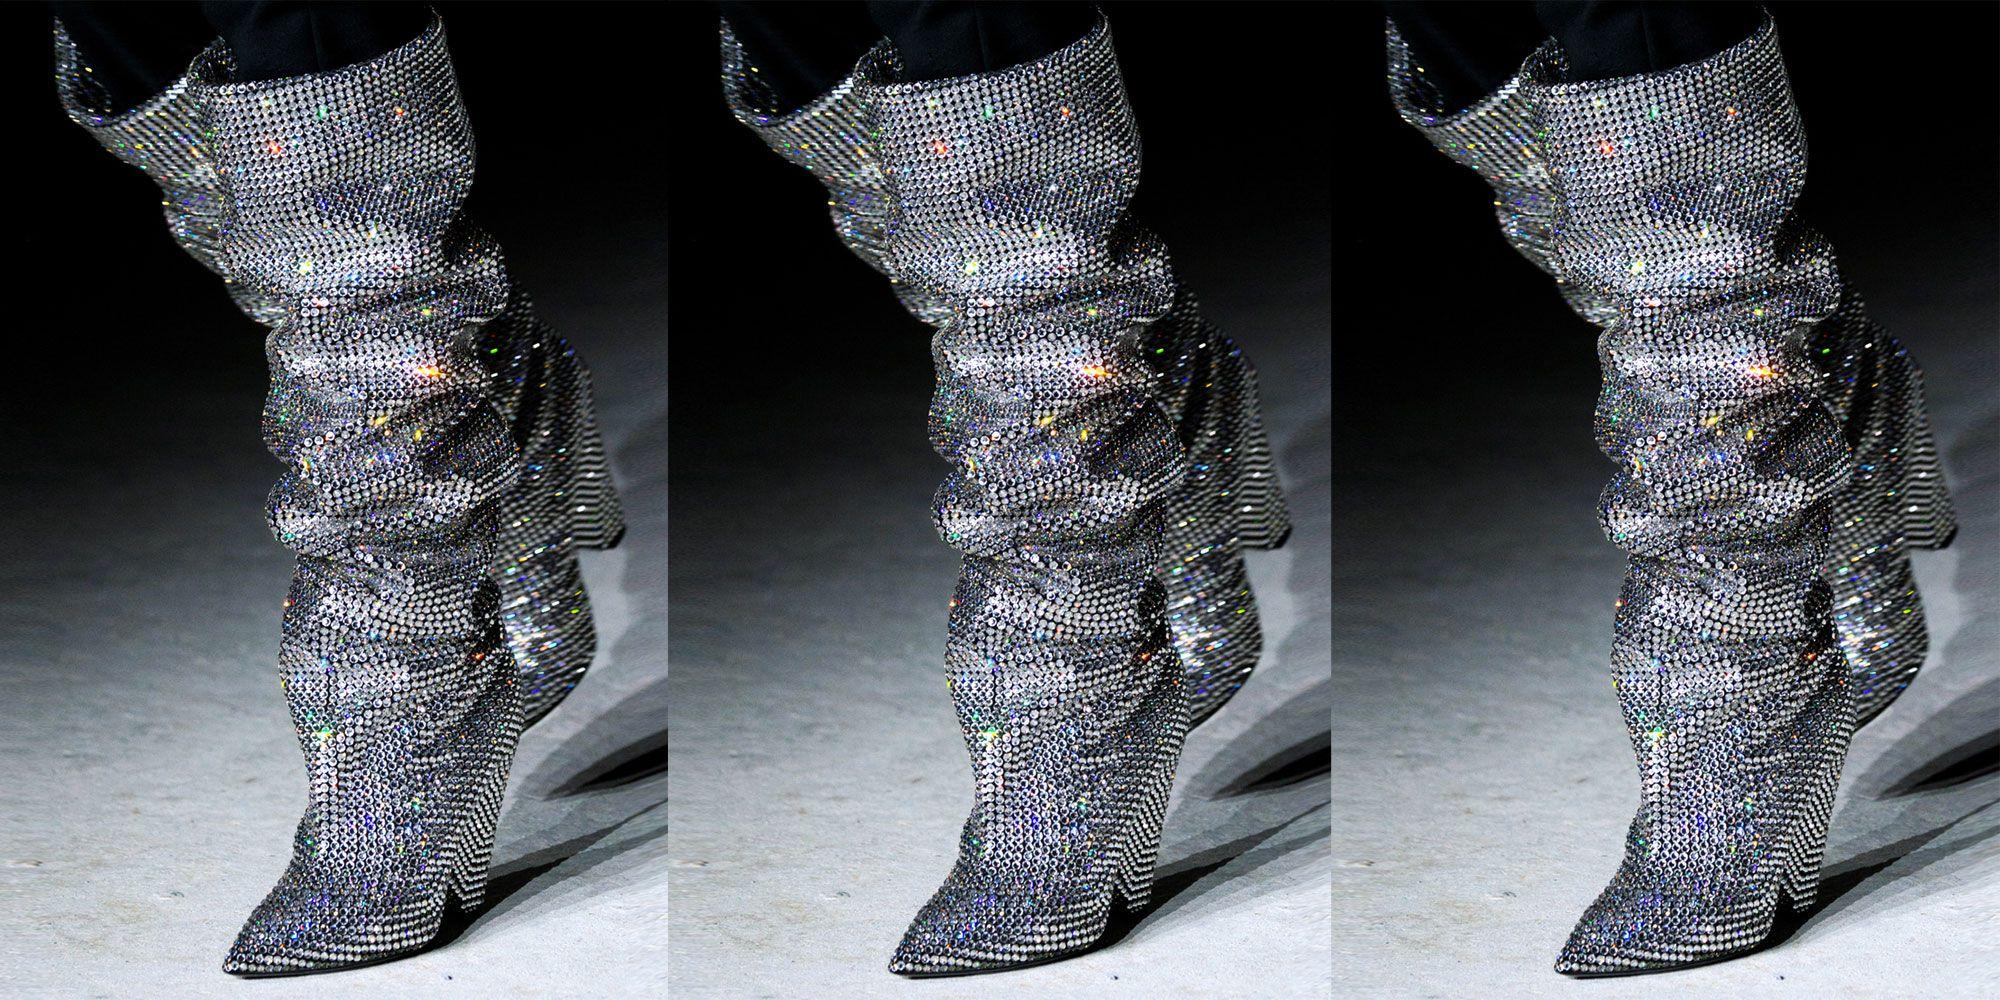 Saint LaurentGlitter Boots daIuzYL